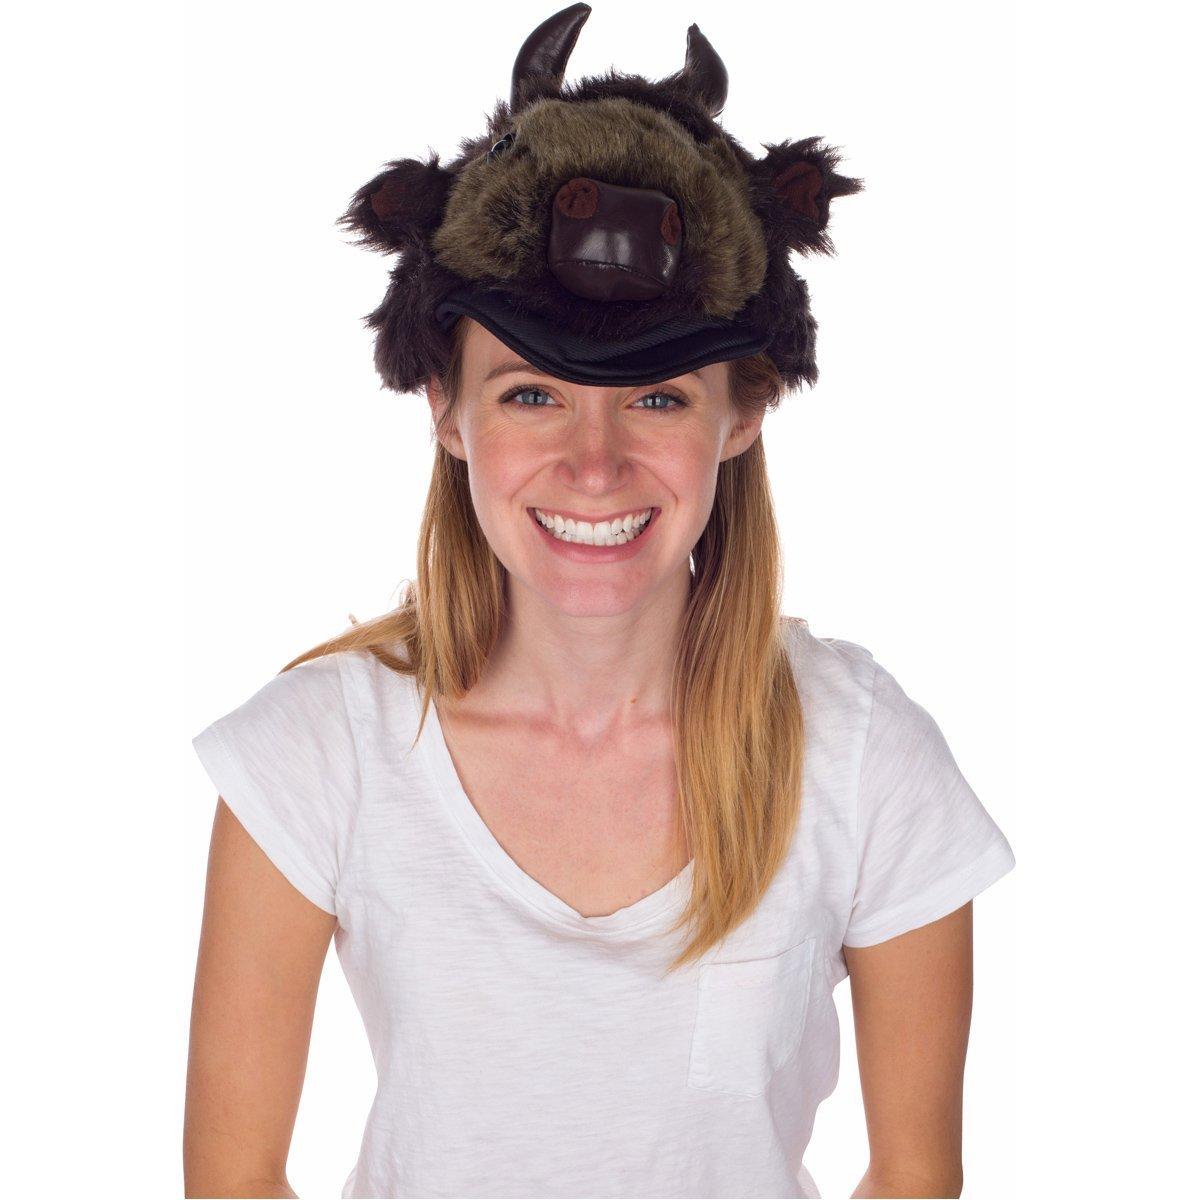 b250024d Rittle Furry Buffalo (Bison) Animal Hat, Realistic Plush Costume Headwear,  1 Size